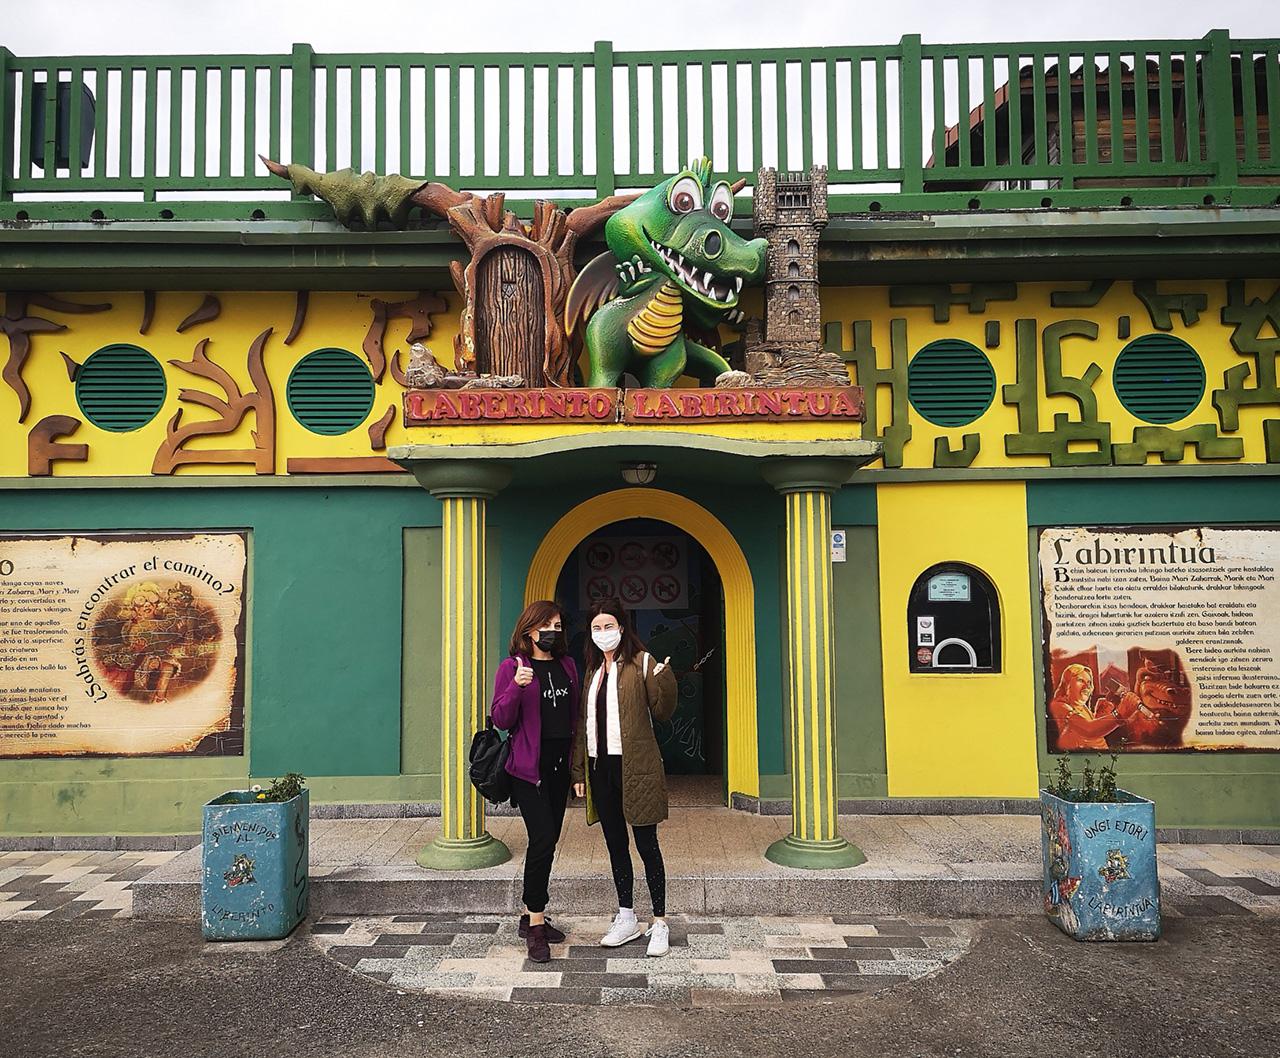 laberinto igueldo - El Monte Igueldo resiste